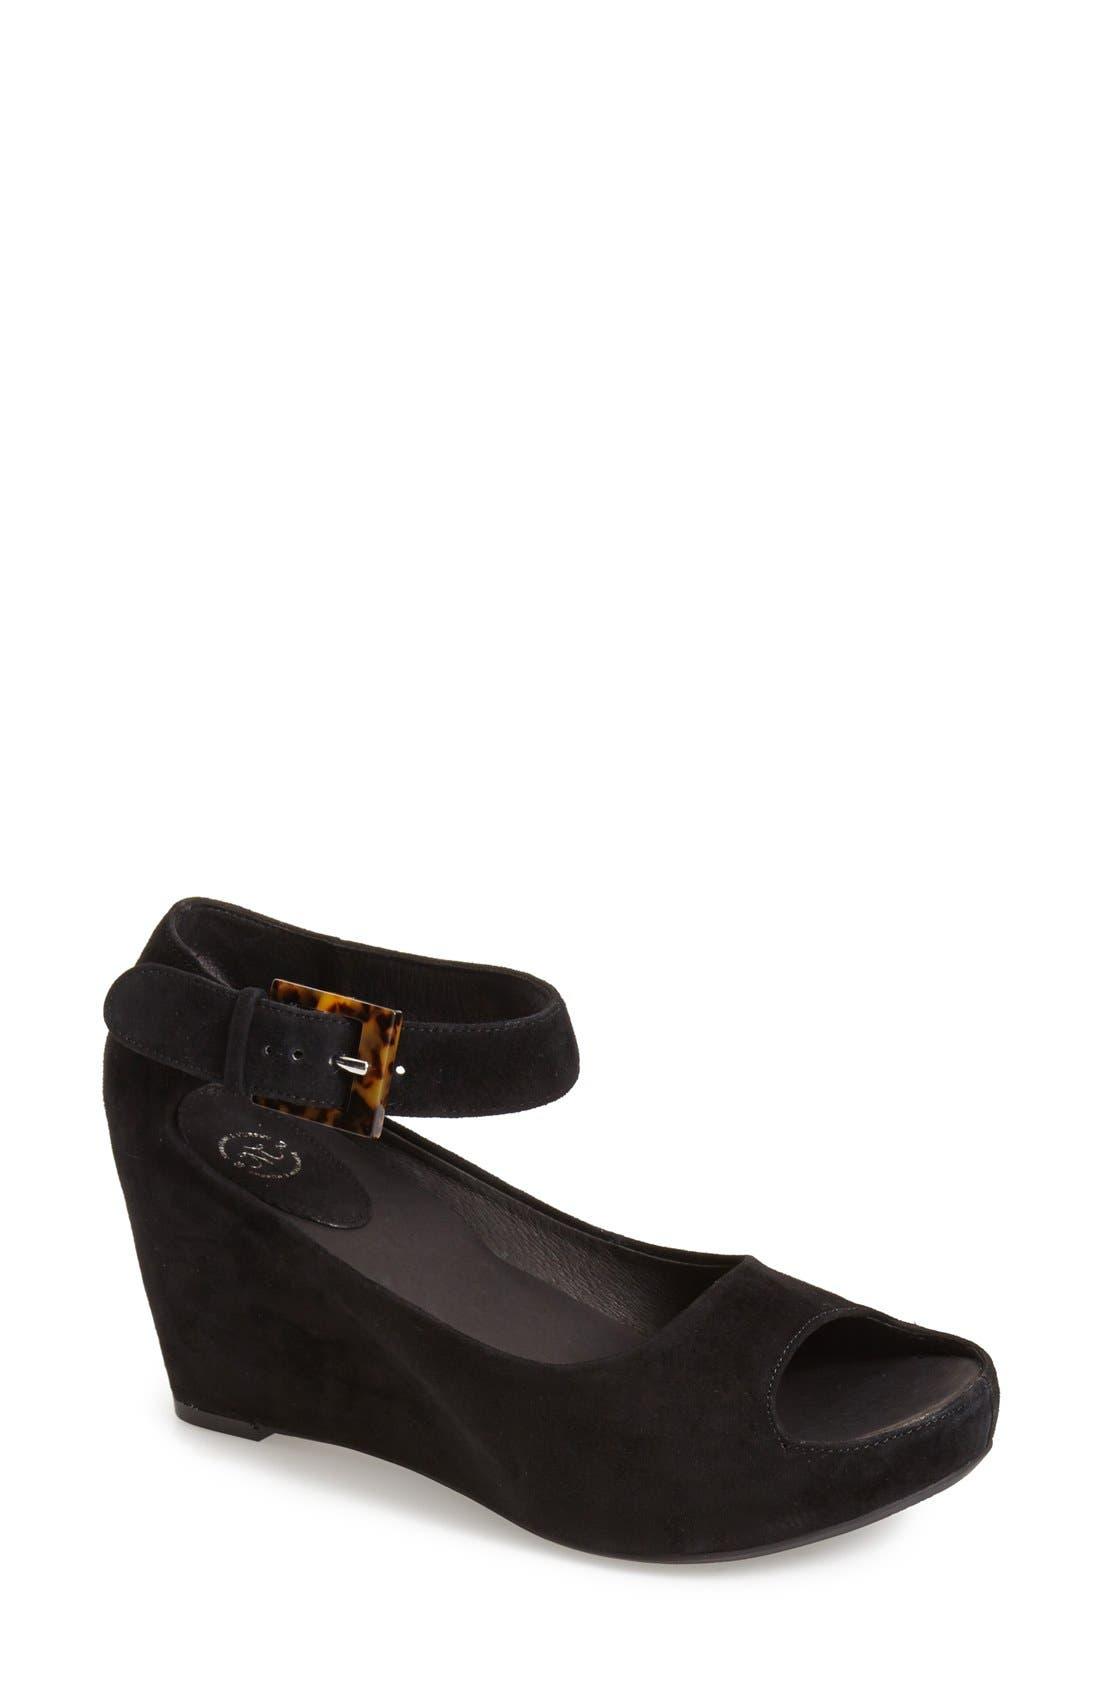 'Tricia' Ankle Strap Sandal,                             Main thumbnail 2, color,